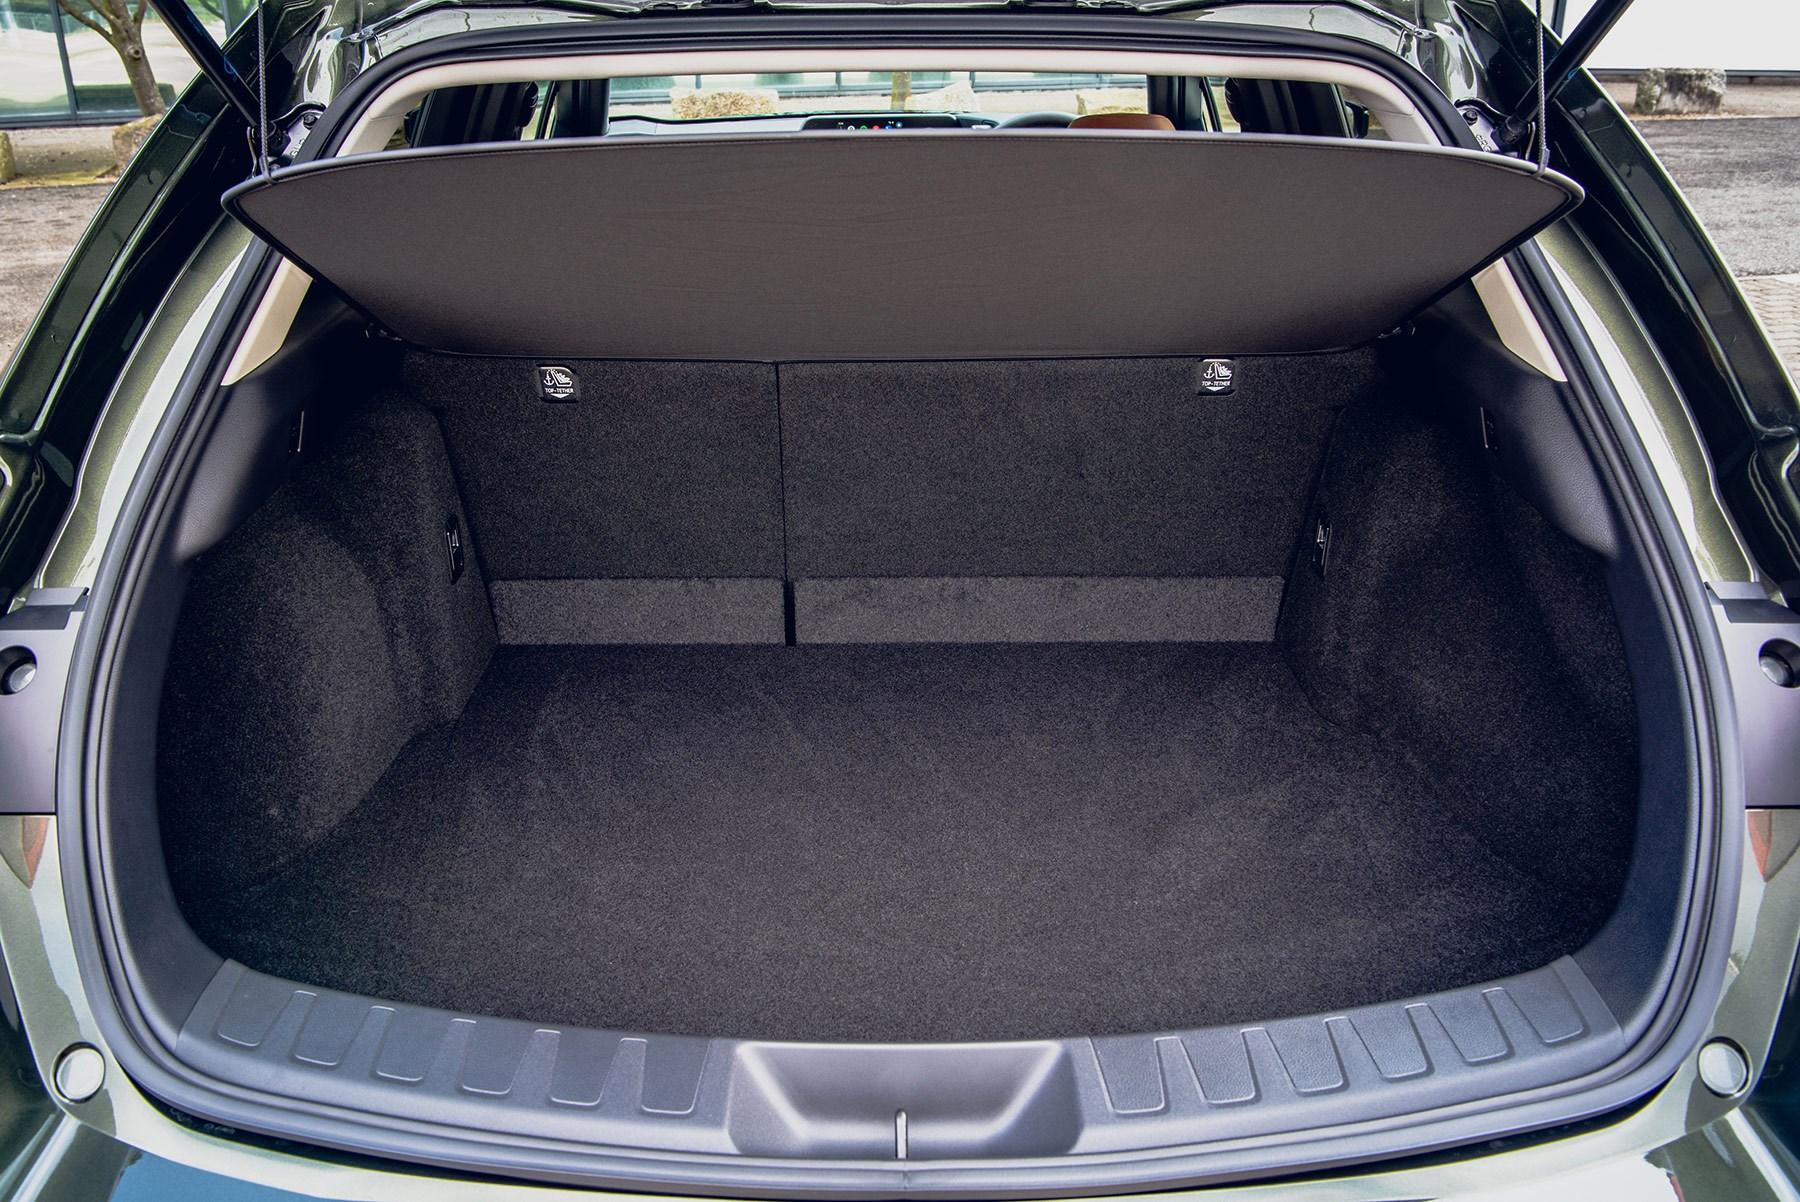 Lexus UX 300e boot: 367 litres of space